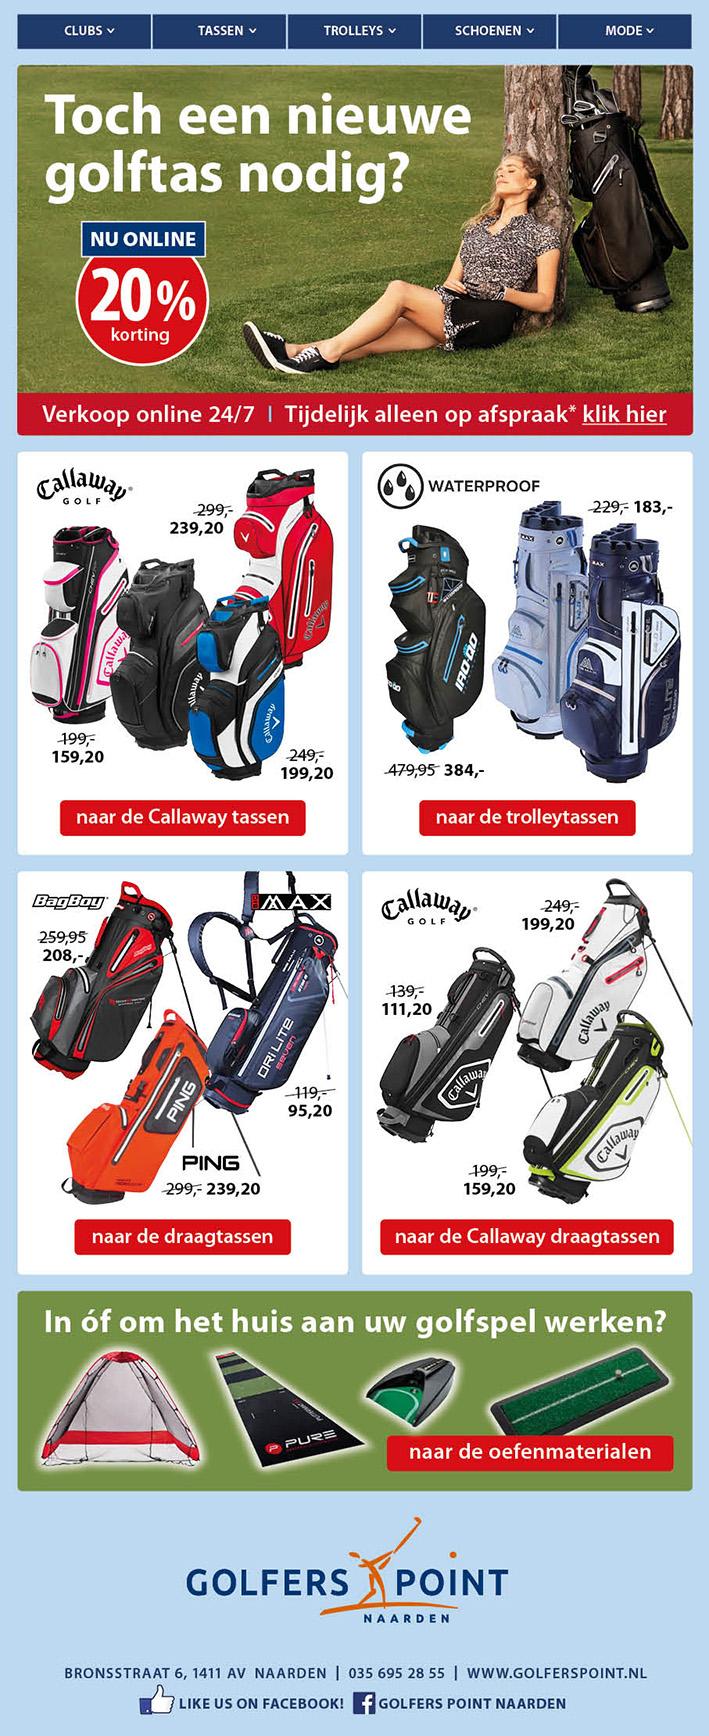 Golfers_Point_Tassen nieuwsbrief_BAS! RECLAME & VORMGEVING